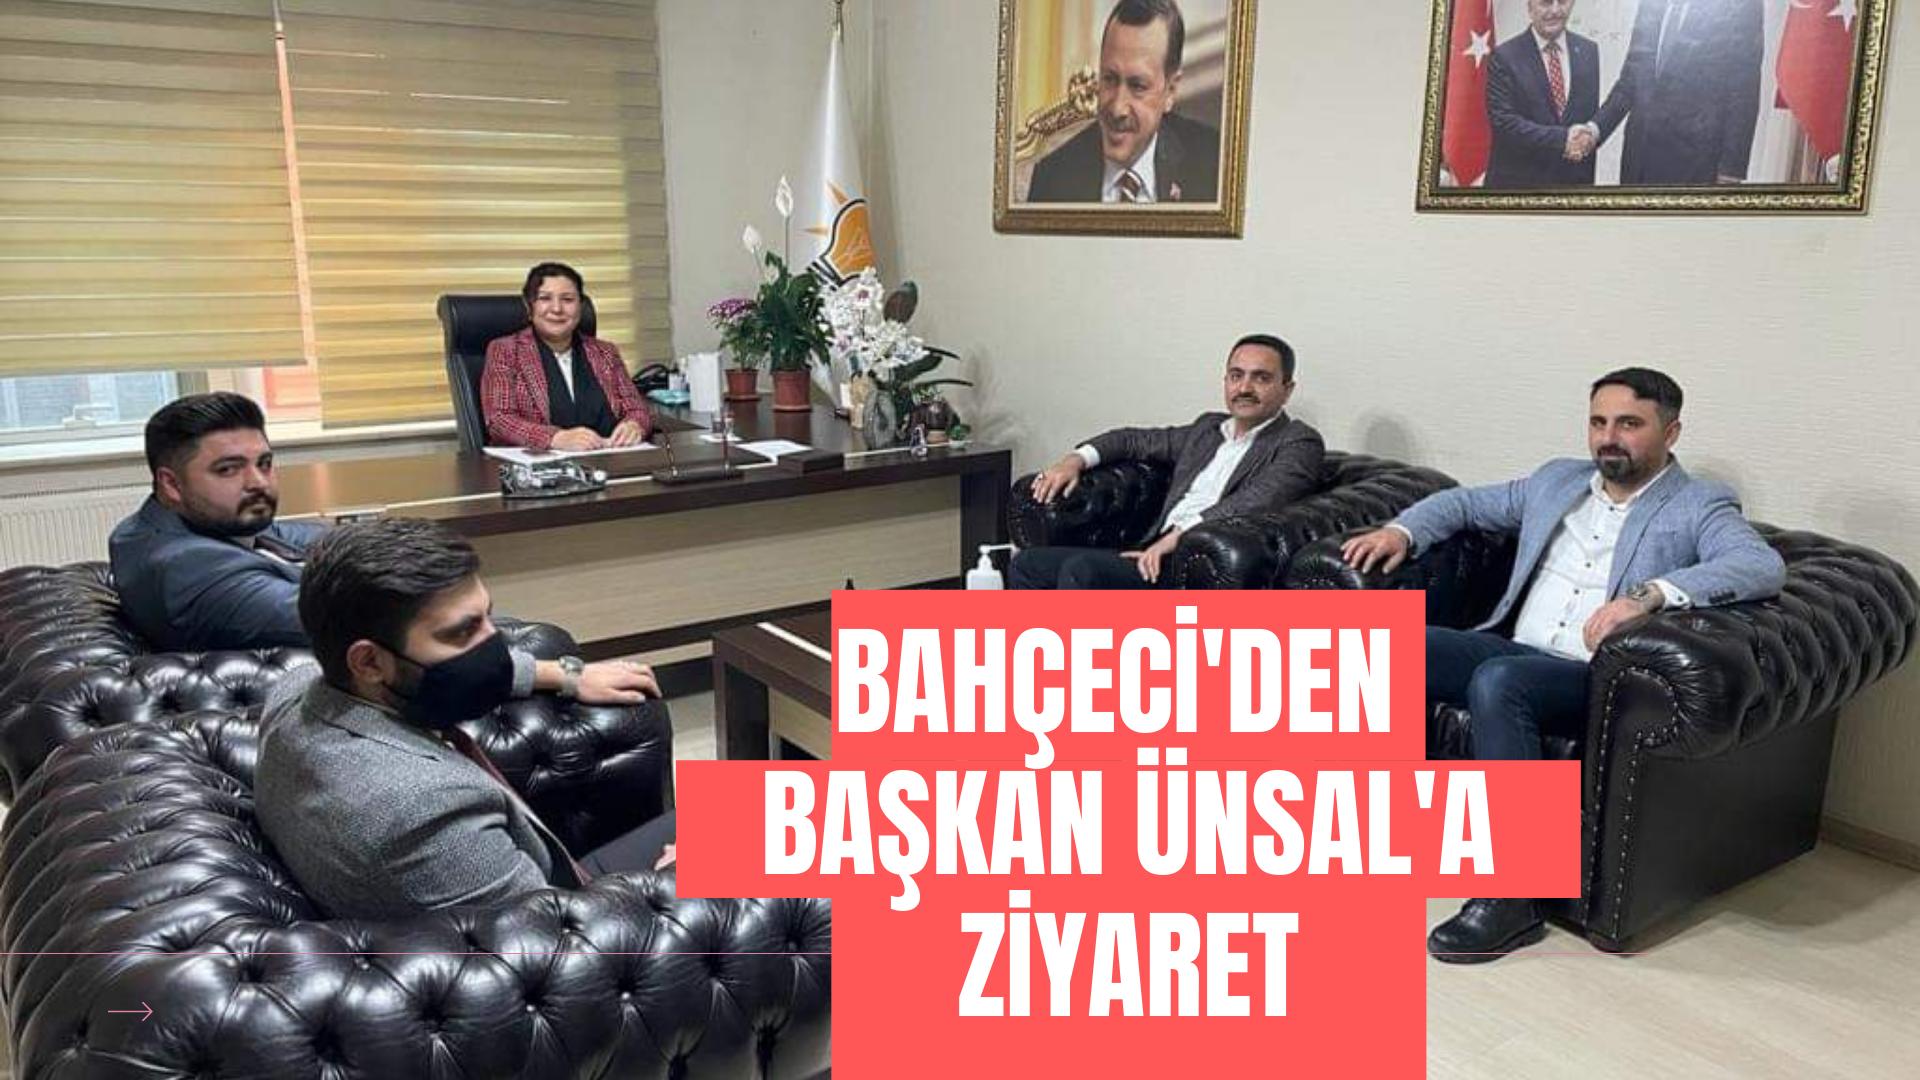 Bahçeci'den Başkan Ünsal'a ziyaret